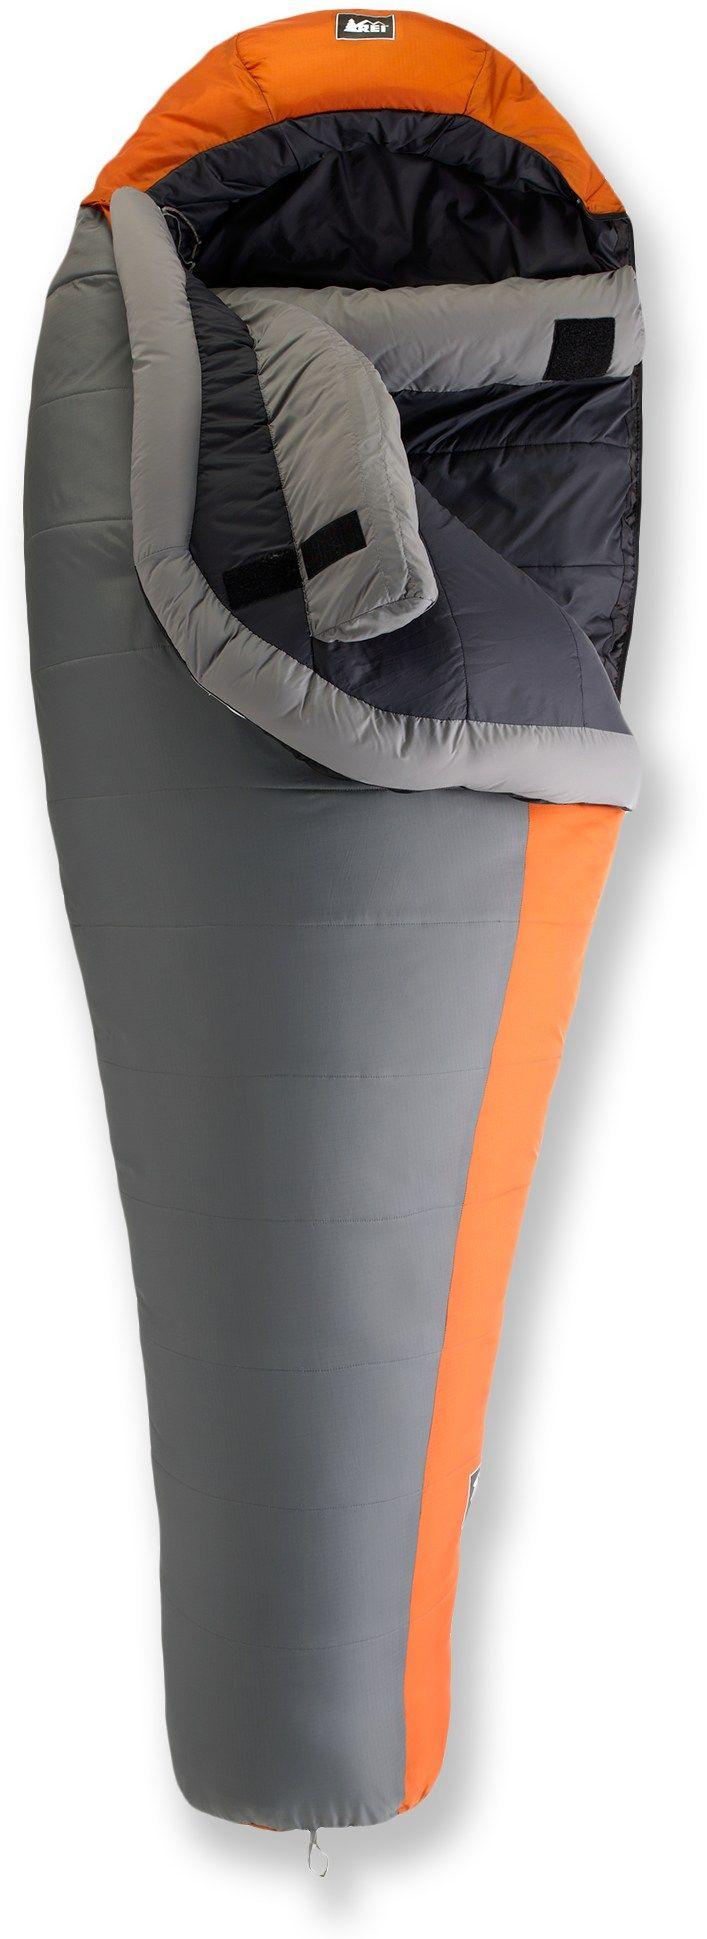 REI Polar Pod +10 Sleeping Bag, bargain warmth for the kids